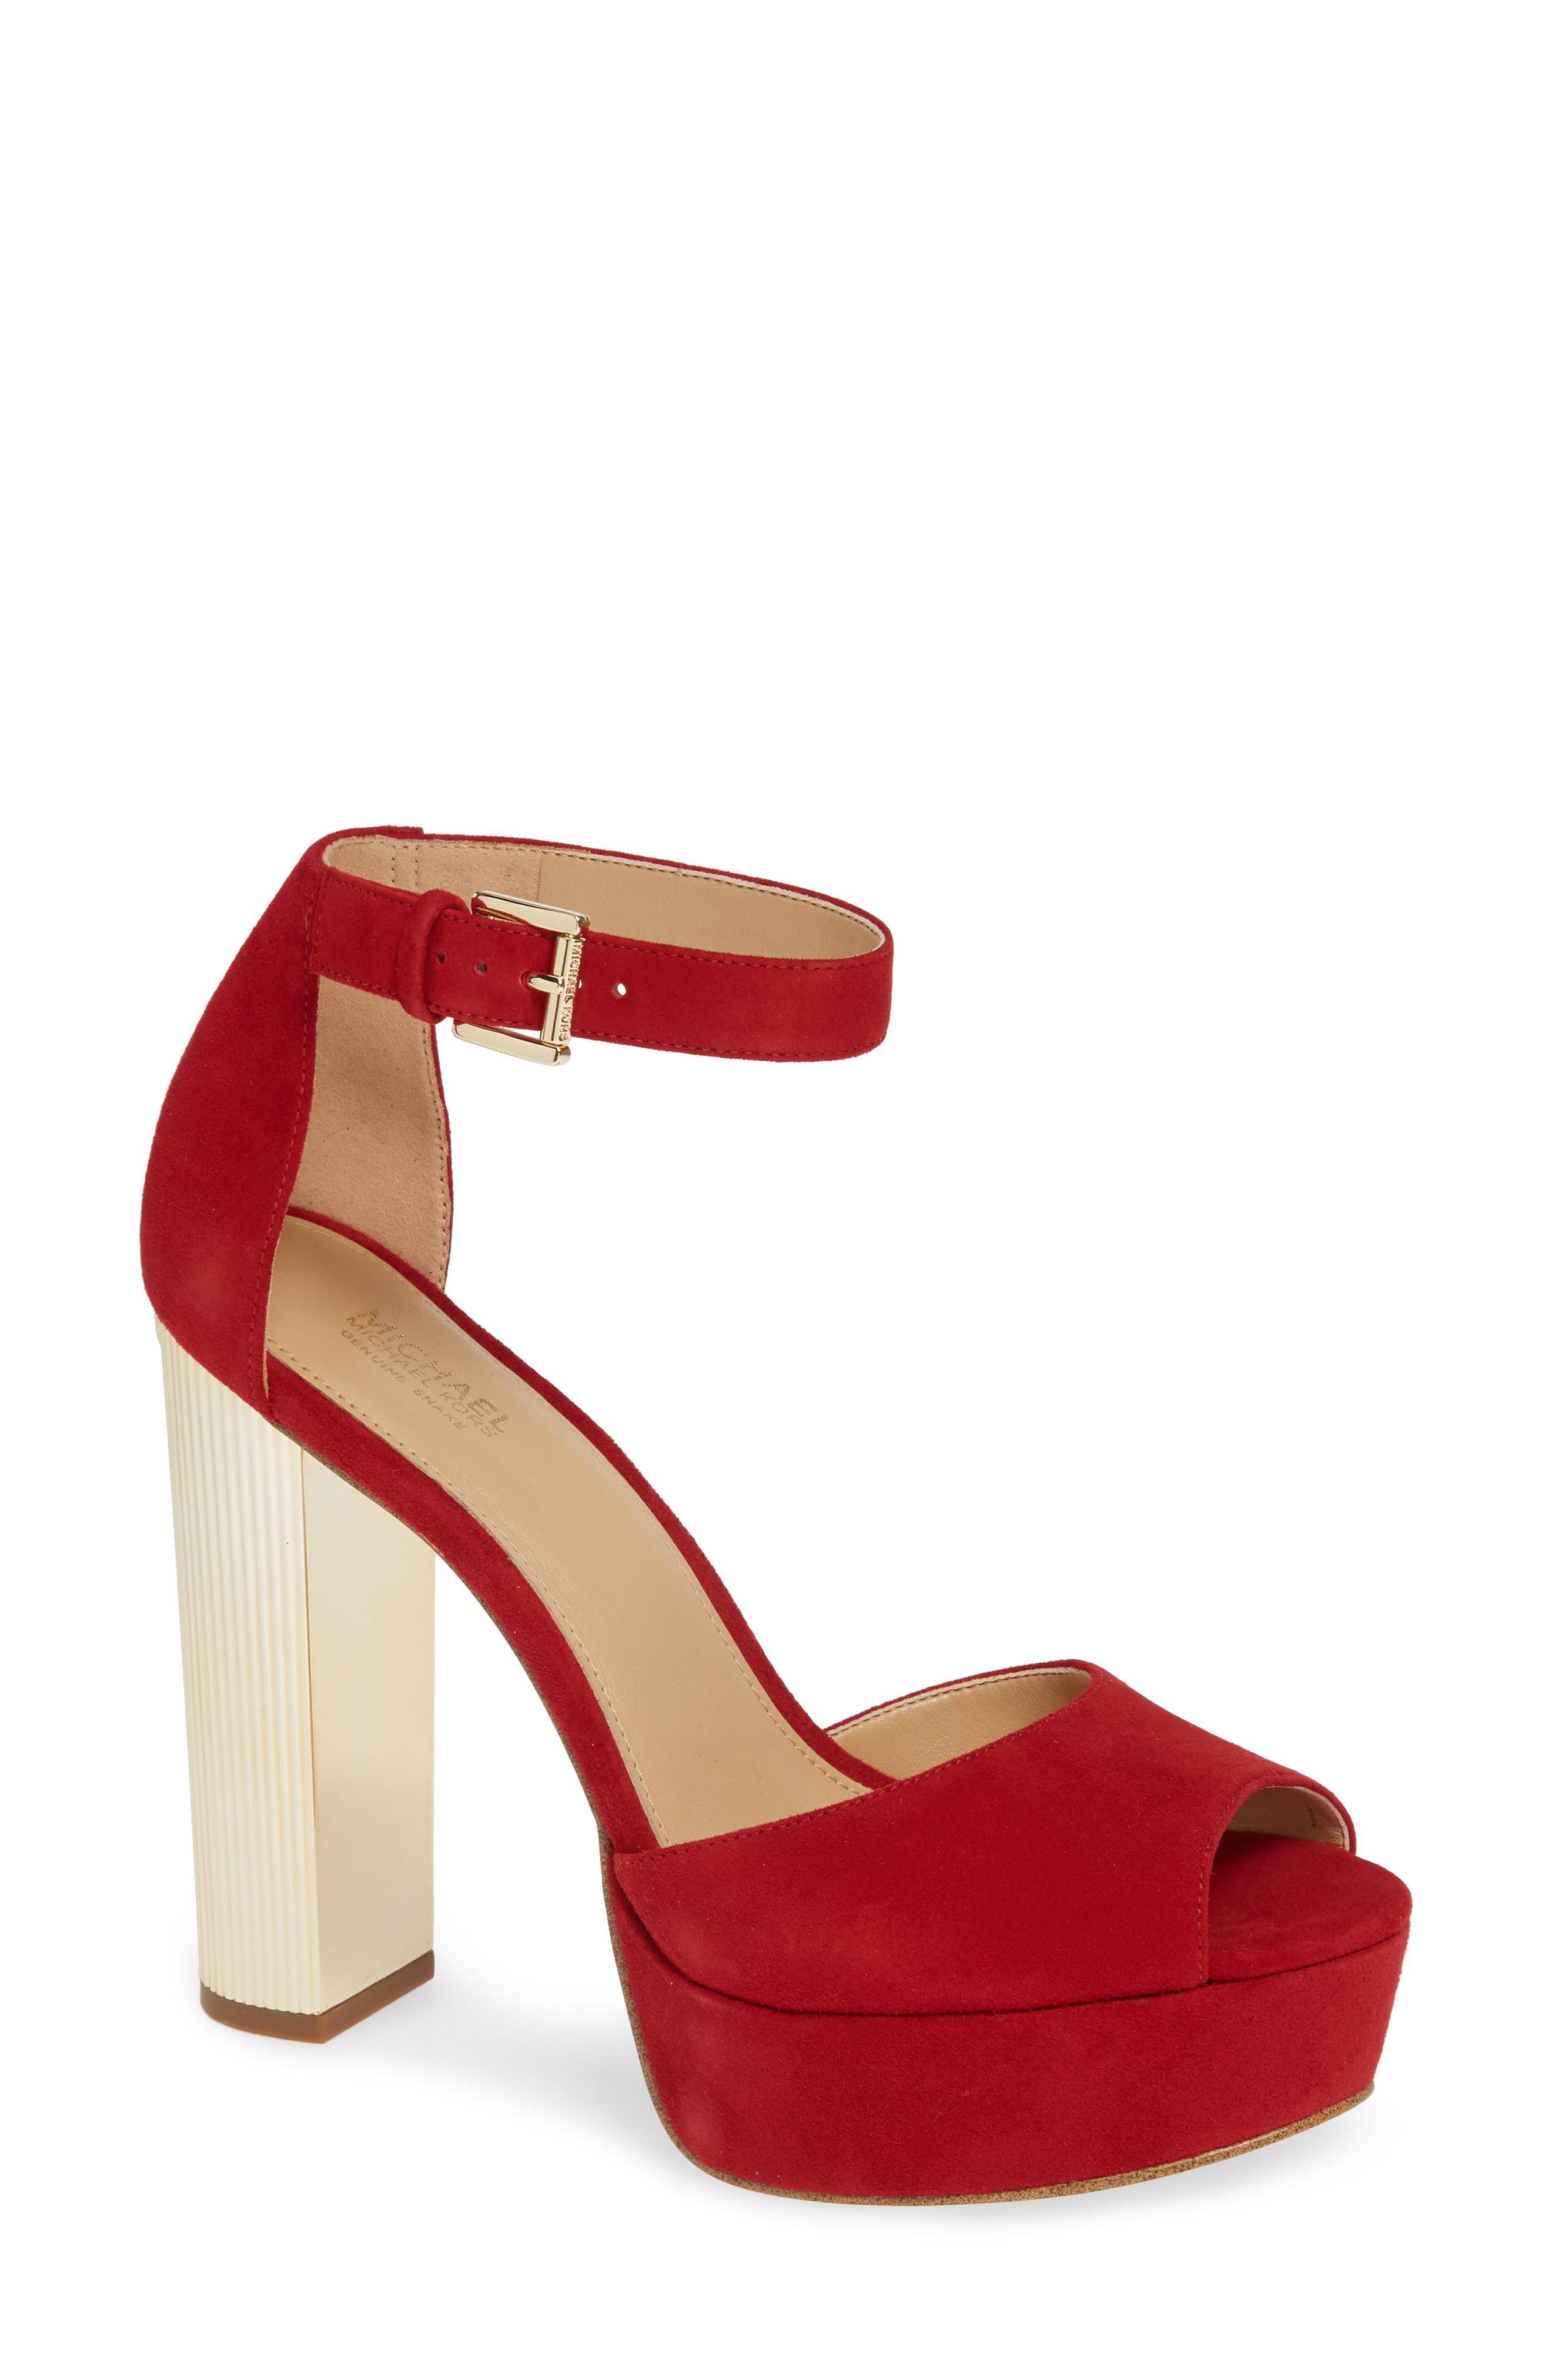 33581e82be4a Lyst - MICHAEL Michael Kors Paloma Metallic Heel Platform Sandal in Red